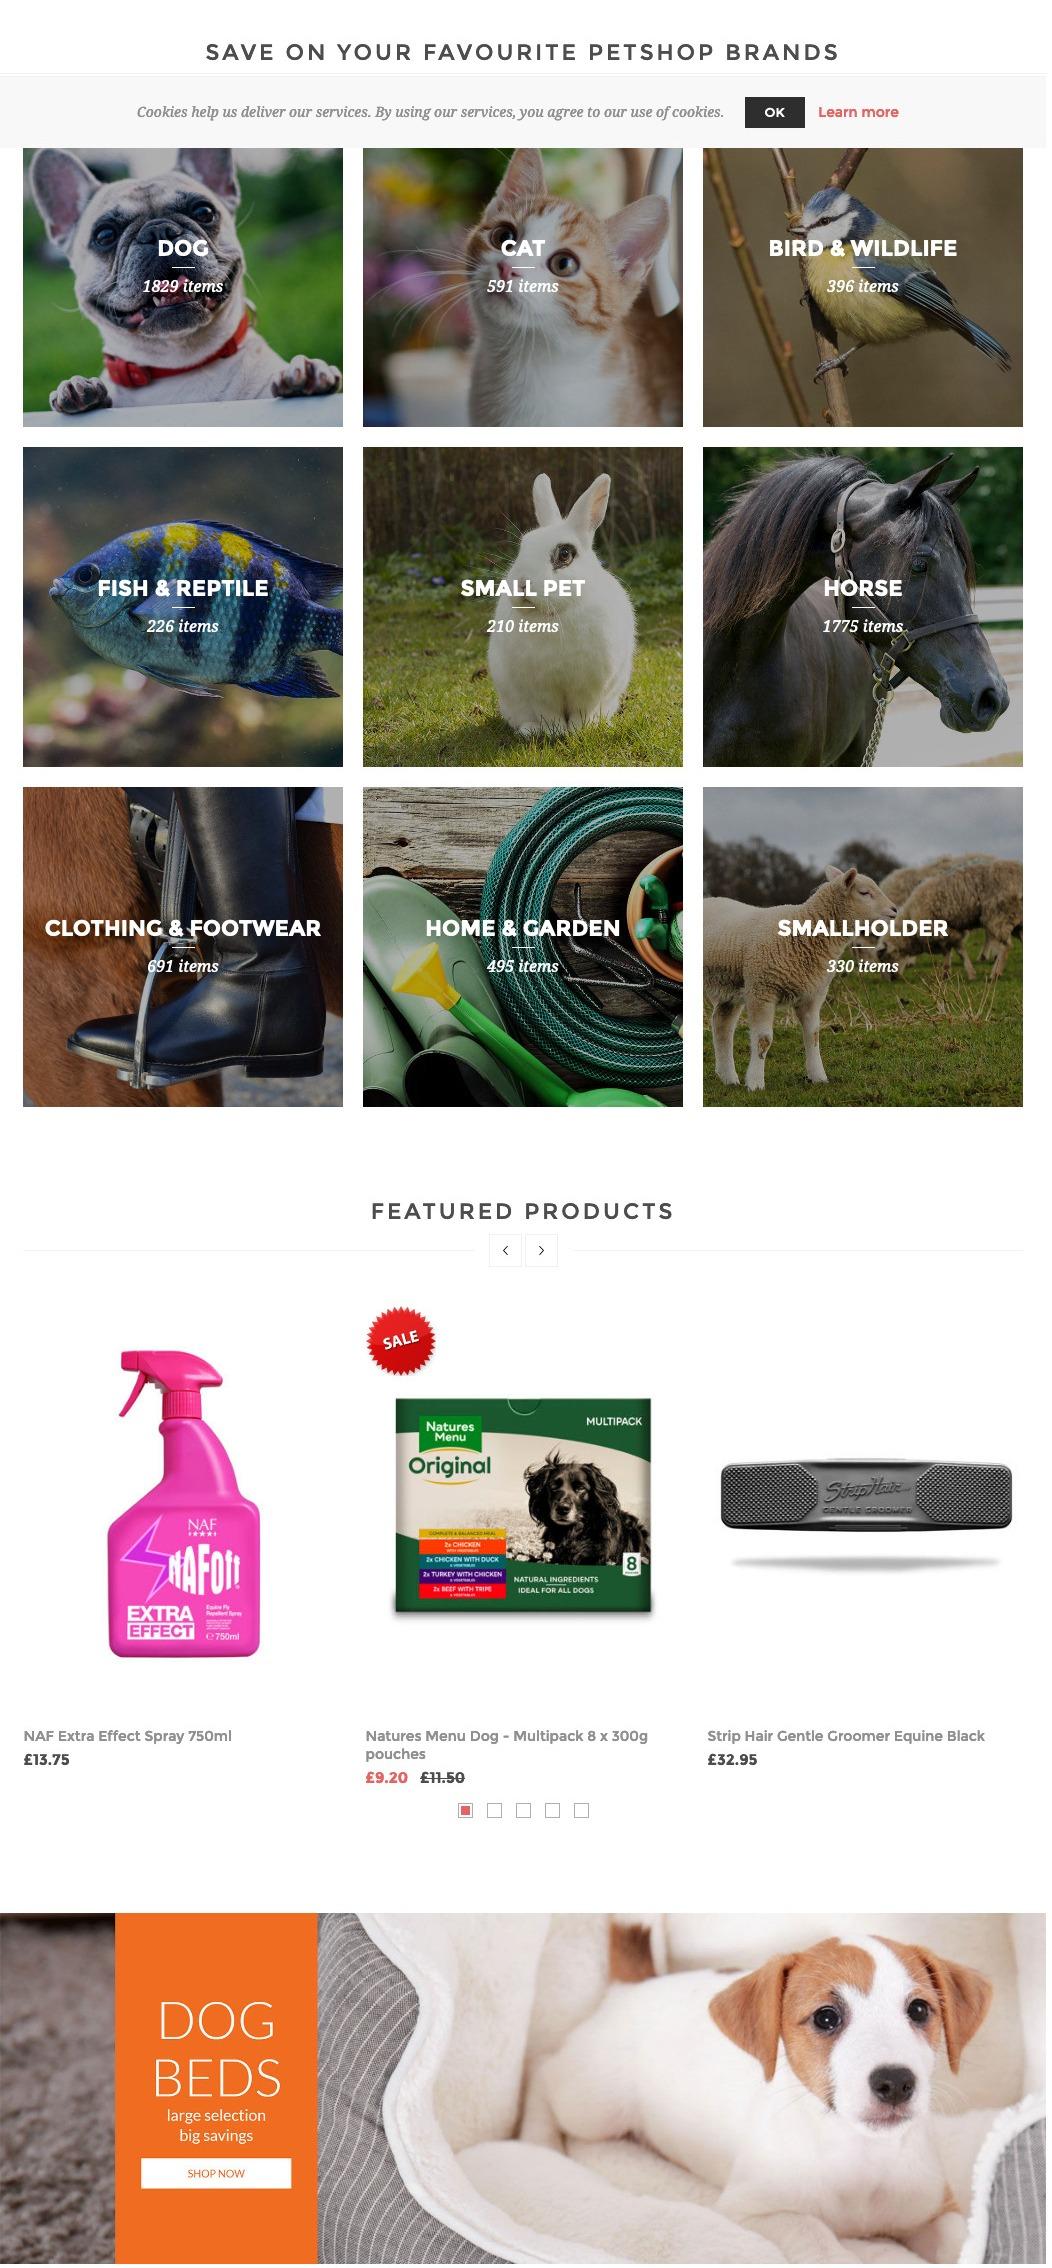 Rokers Pet Supplies NopCommerce ecommerce store